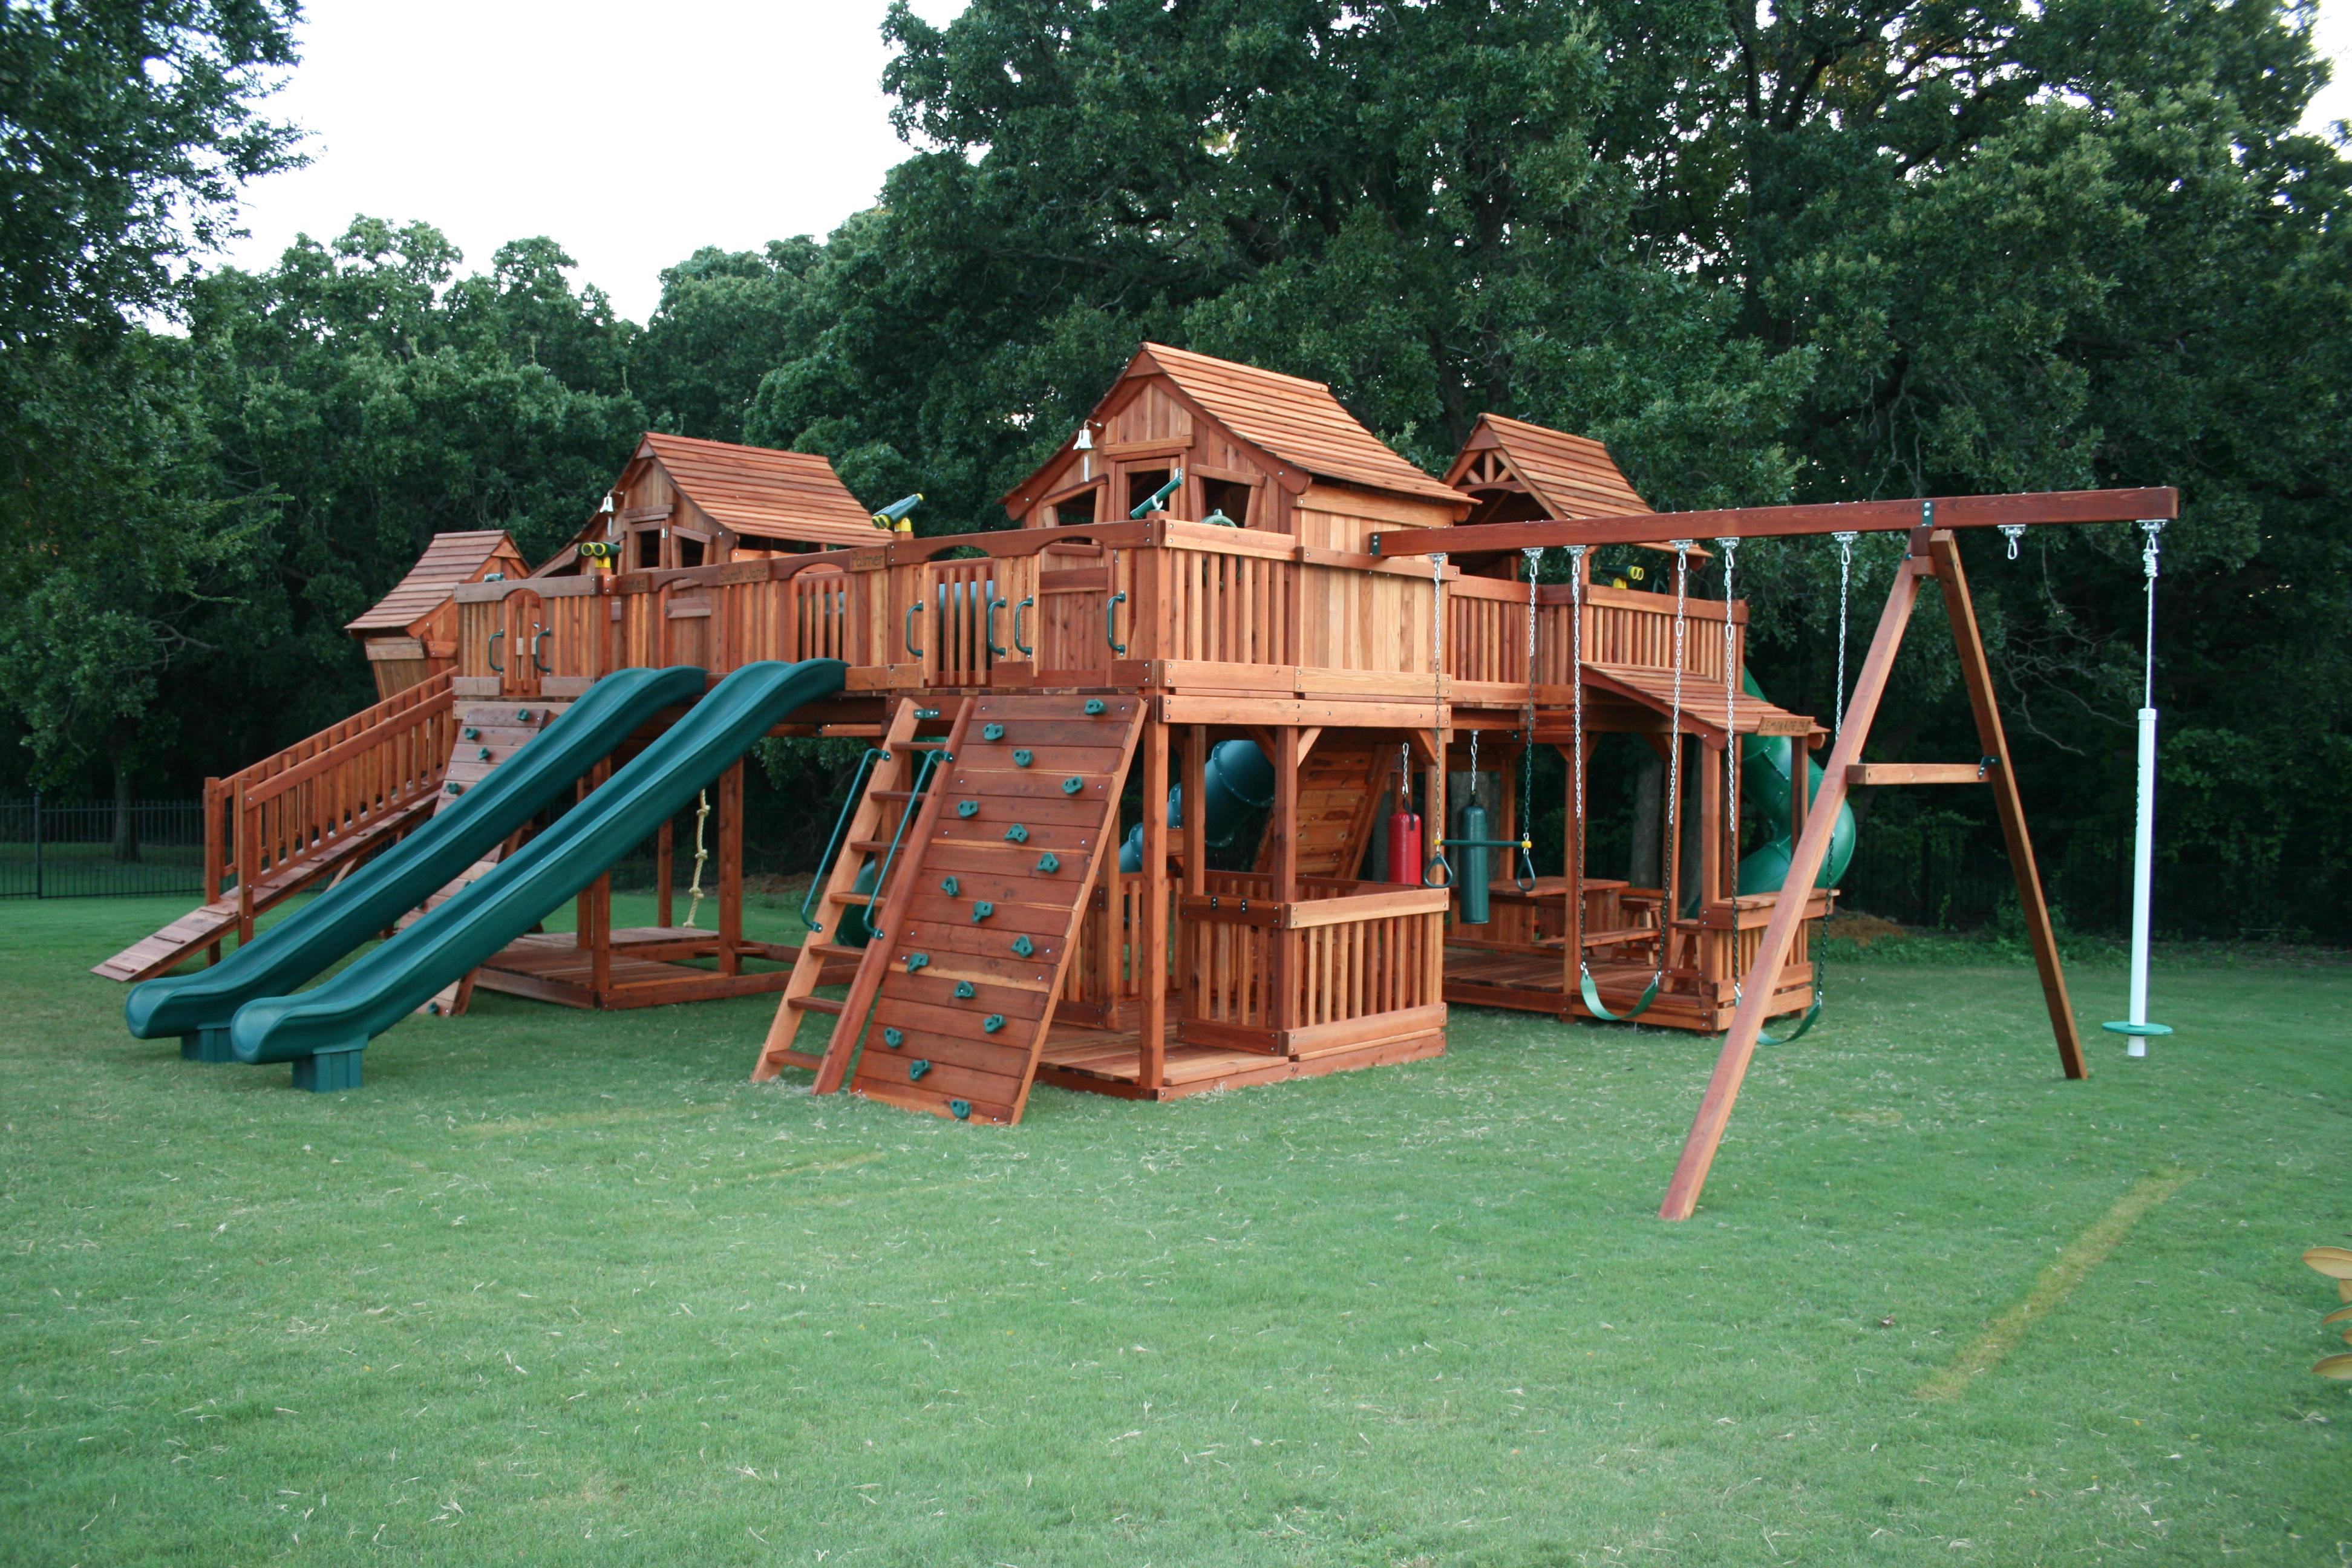 Backyard Fun Factory - Justin, TX - Business Profile